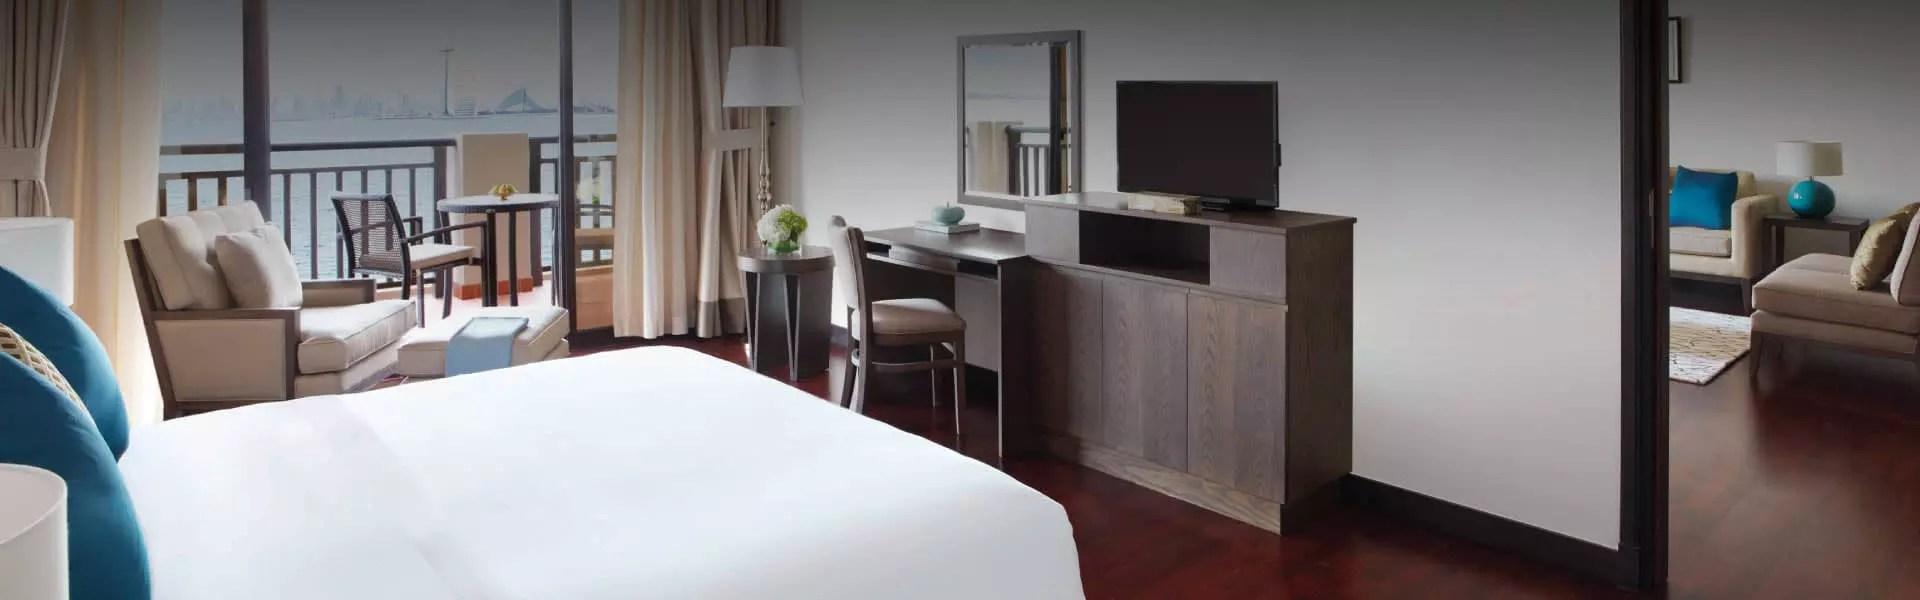 Dubai Residences One Bedroom Apartment At Anantara Dubai